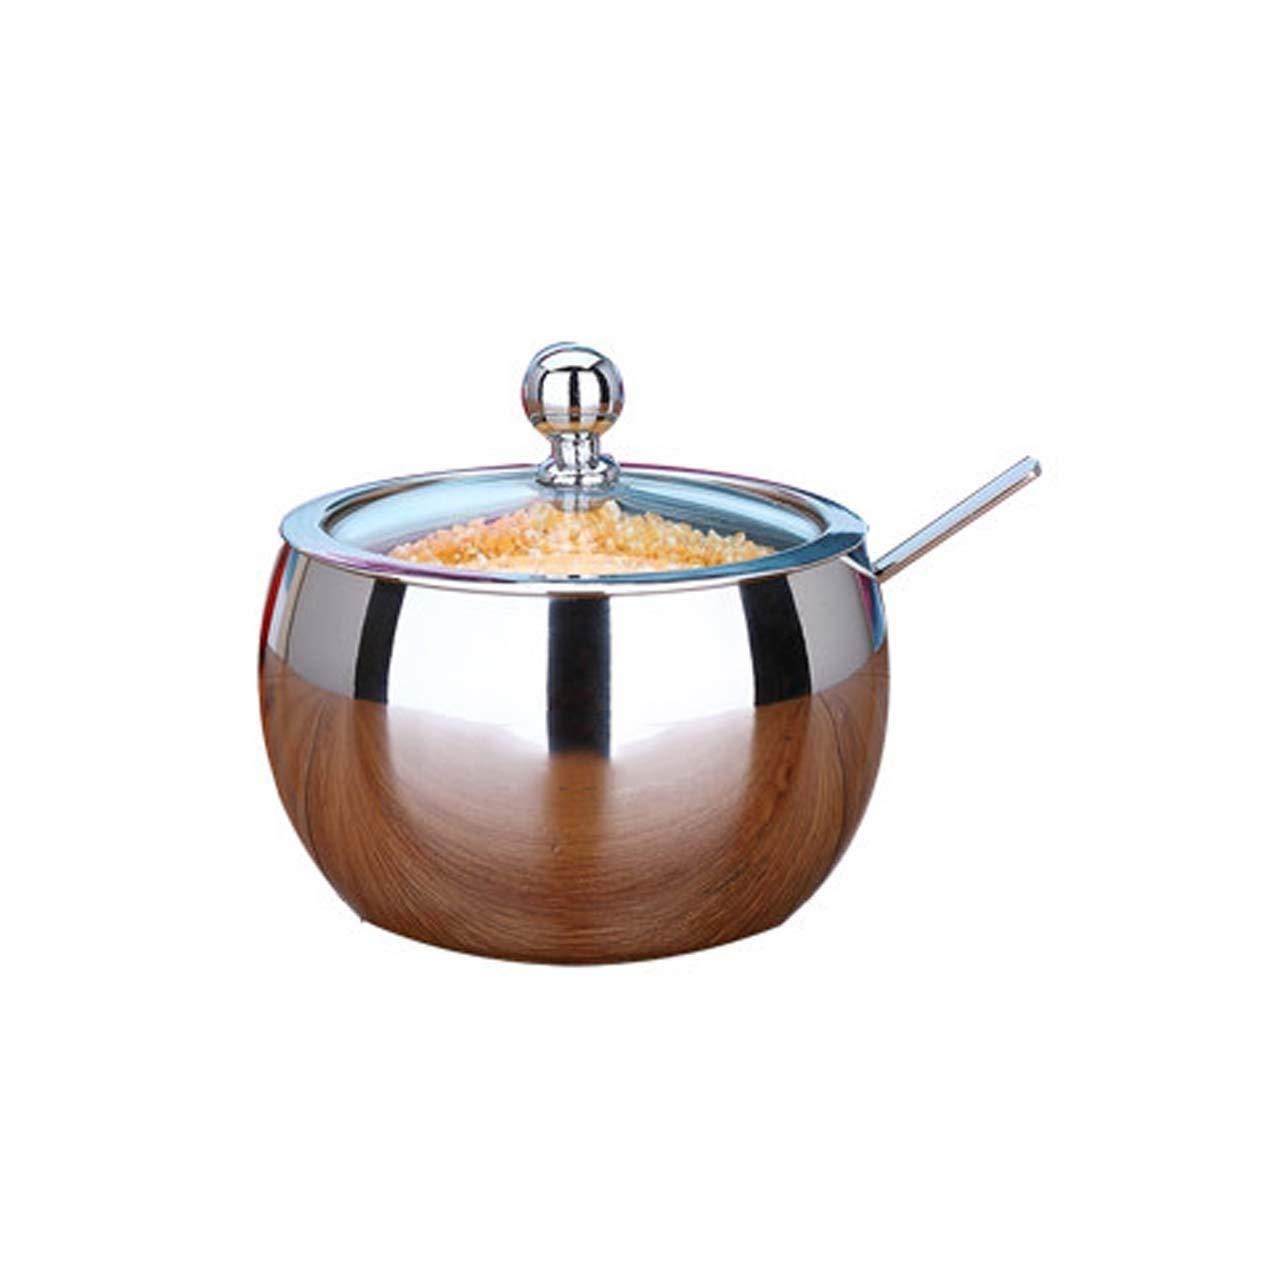 HLL Seasoning Bottle 304 Stainless Steel Seasoning Cans, European Seasoning Box Set, Glass Sugar Cans, Home Seasoning Pot Sets, Kitchen Utensils 1 Assembly